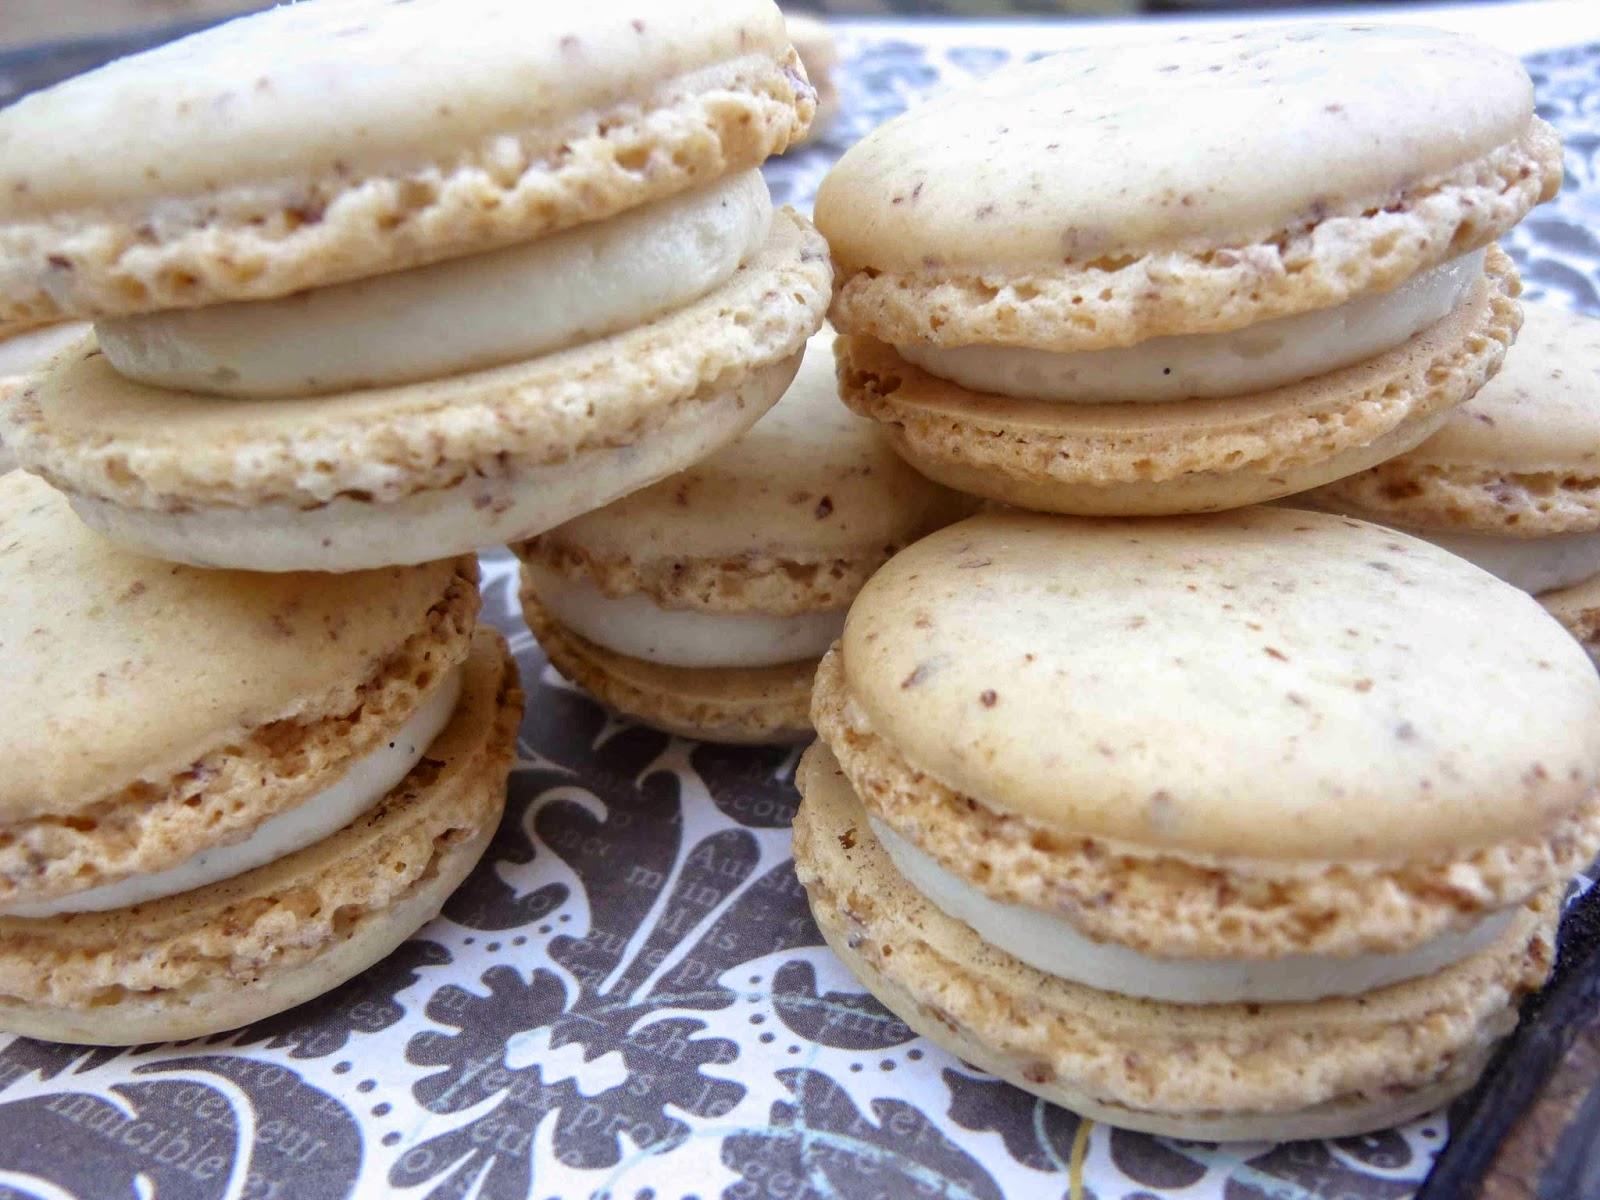 ... Hausfrau: Macaron Monday: Sassafras Macarons with Vanilla Bean Filling